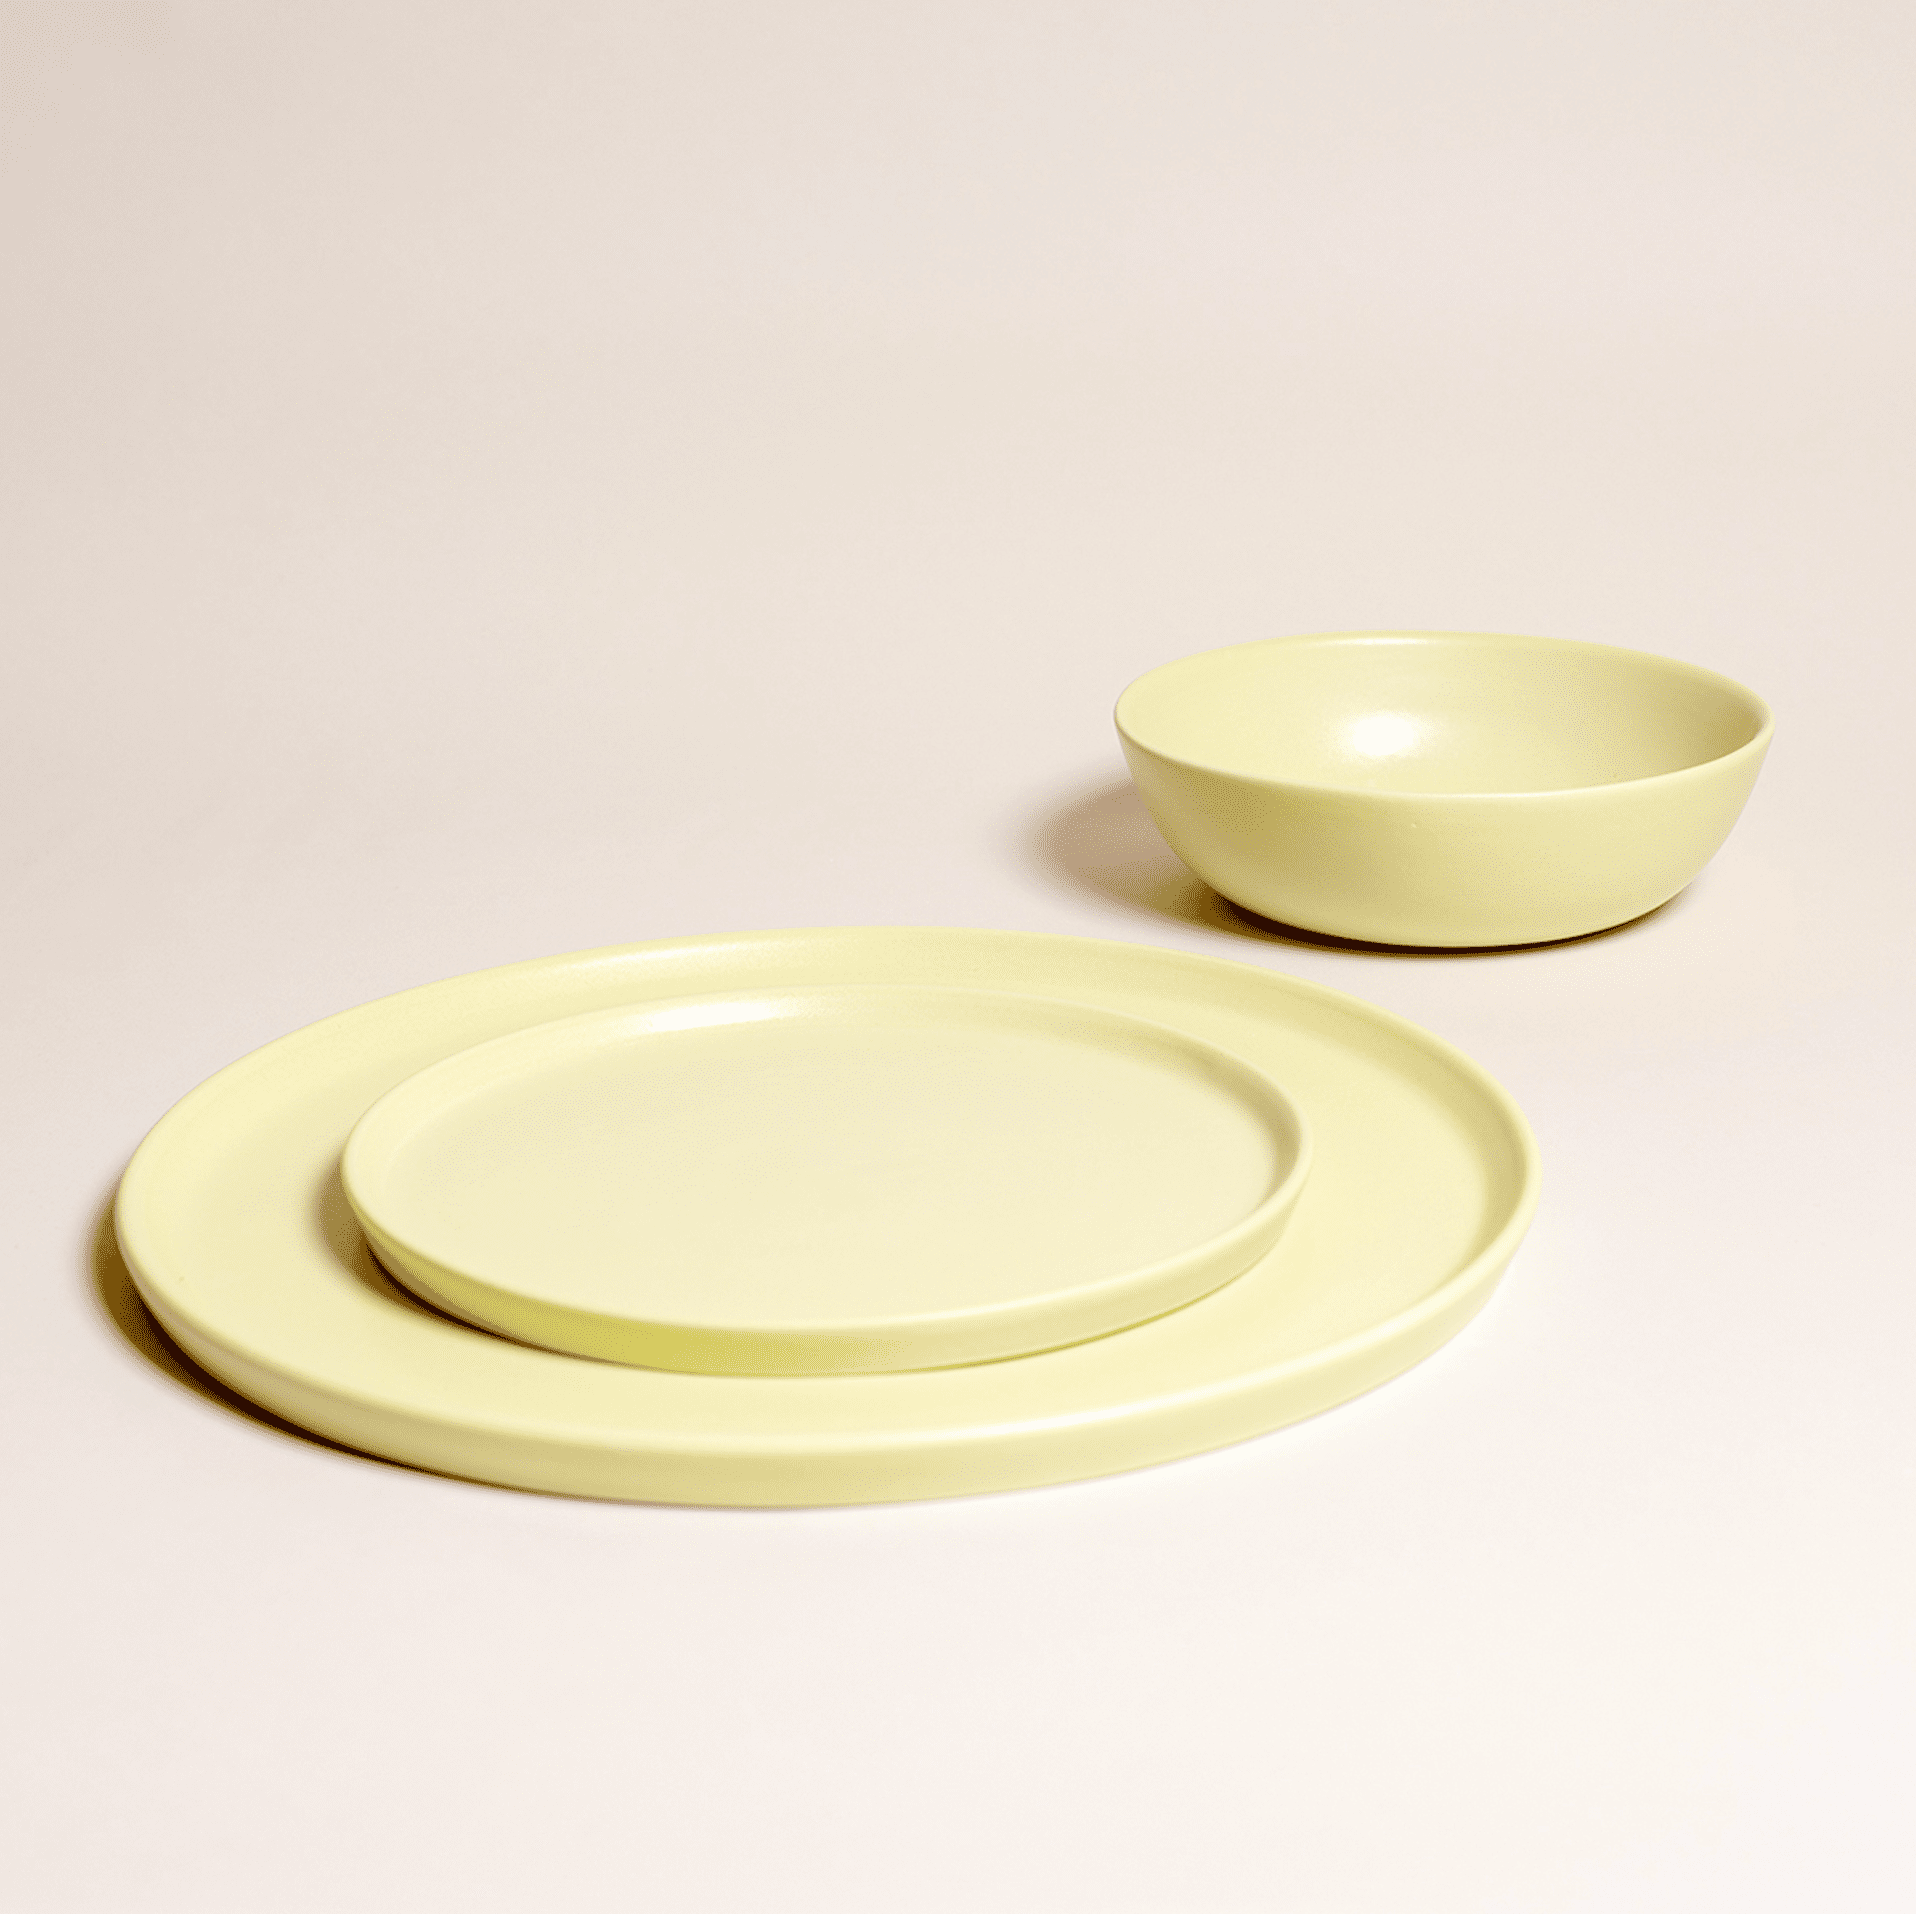 Simple dining set